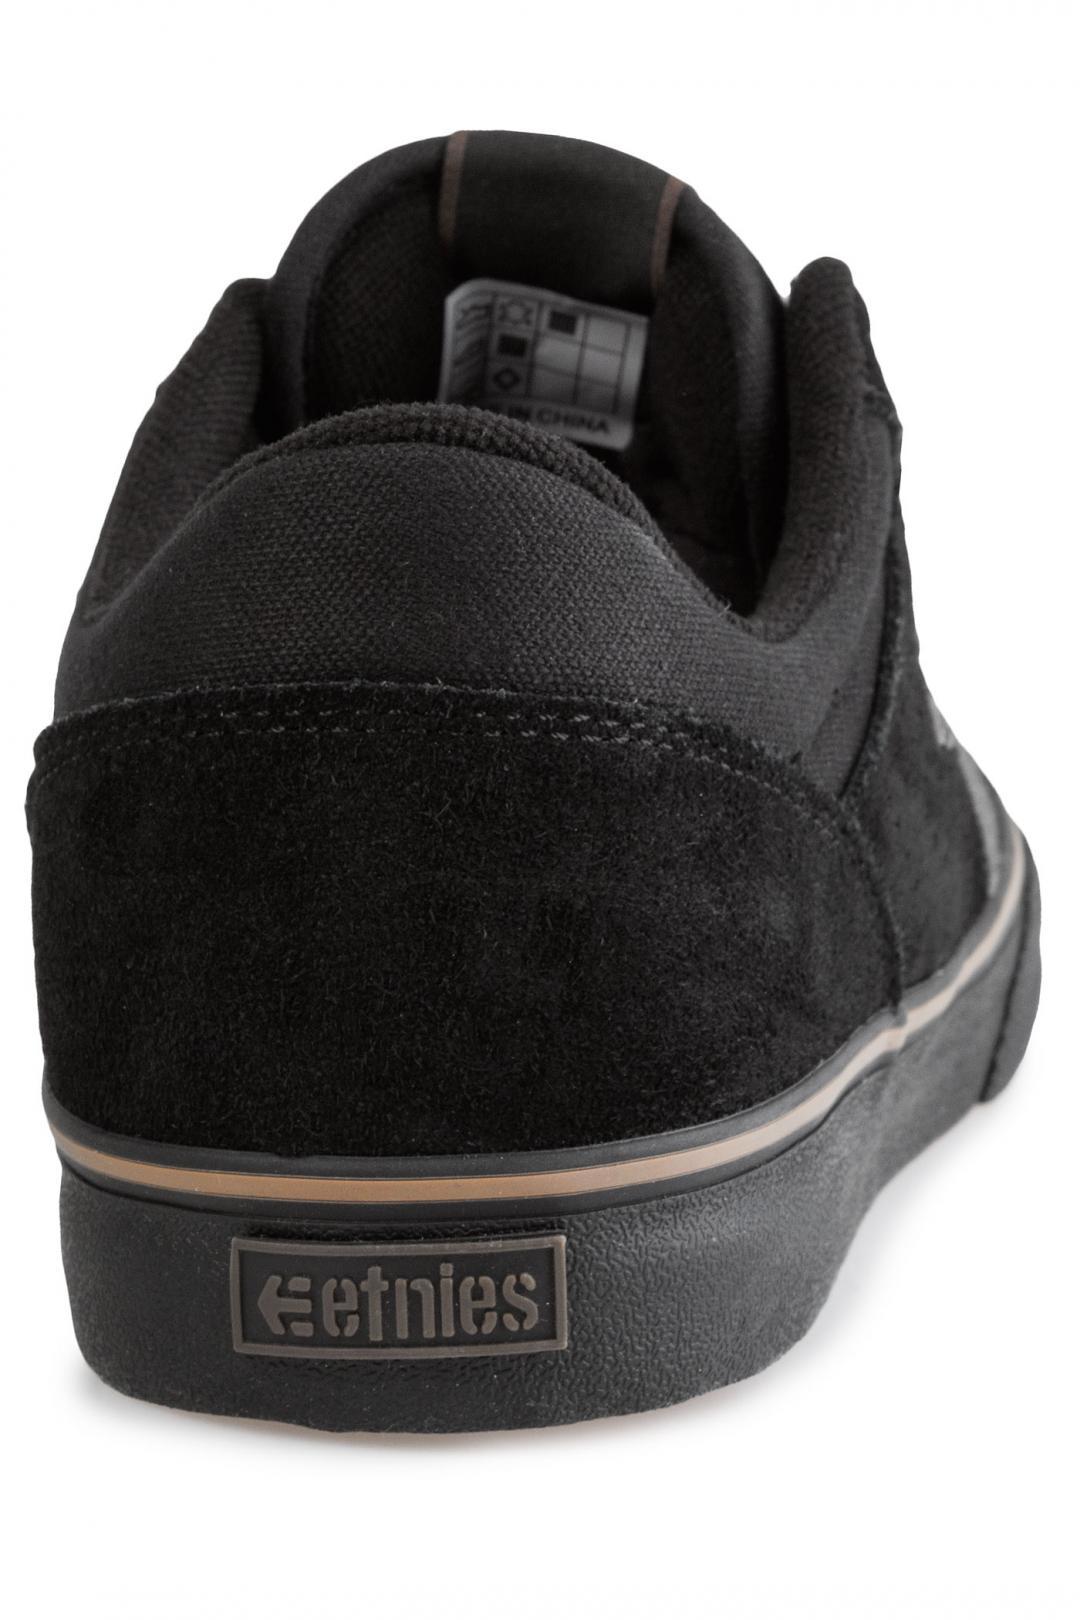 Uomo Etnies Marana Vulc black dark grey gum   Scarpe da skate